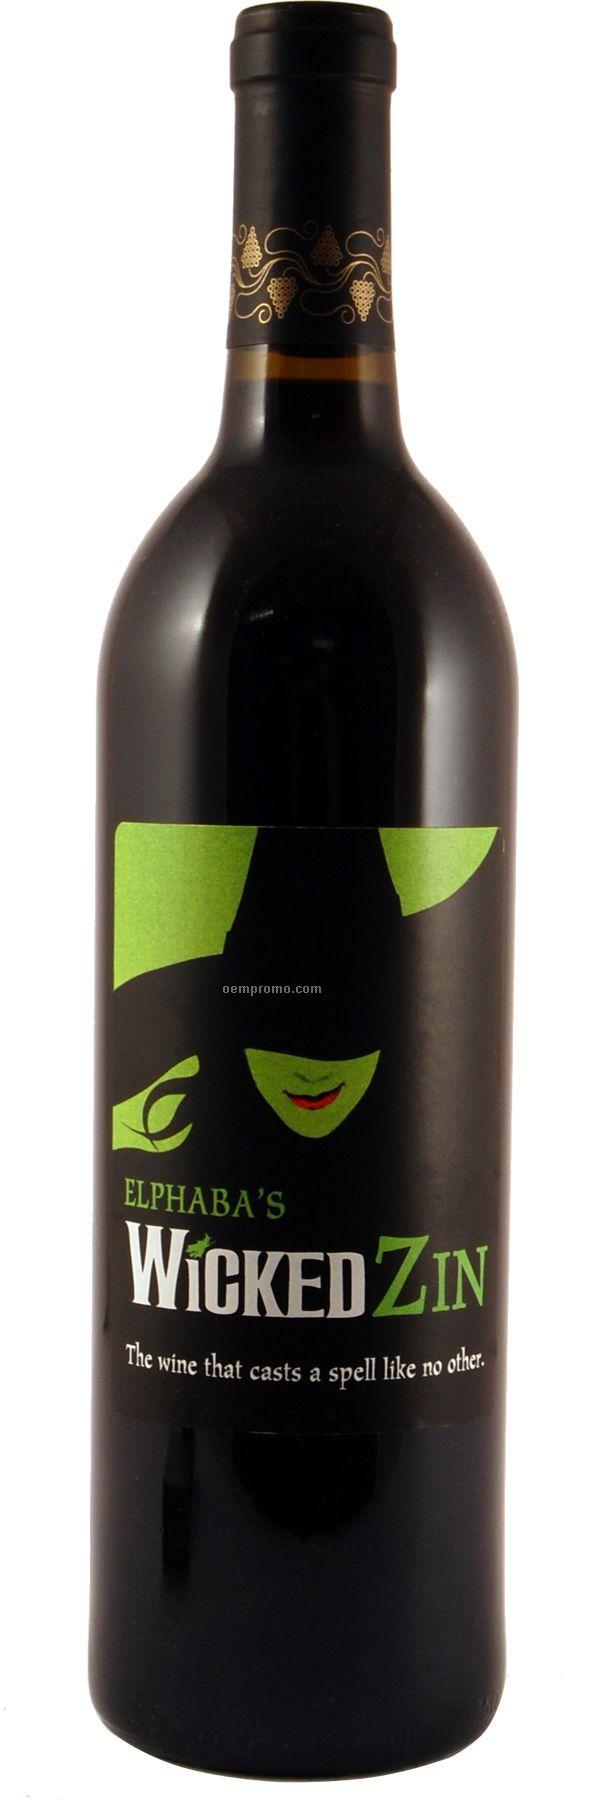 2007 Wv Zinfandel, Lodi Wine (Custom Labeled Wine)